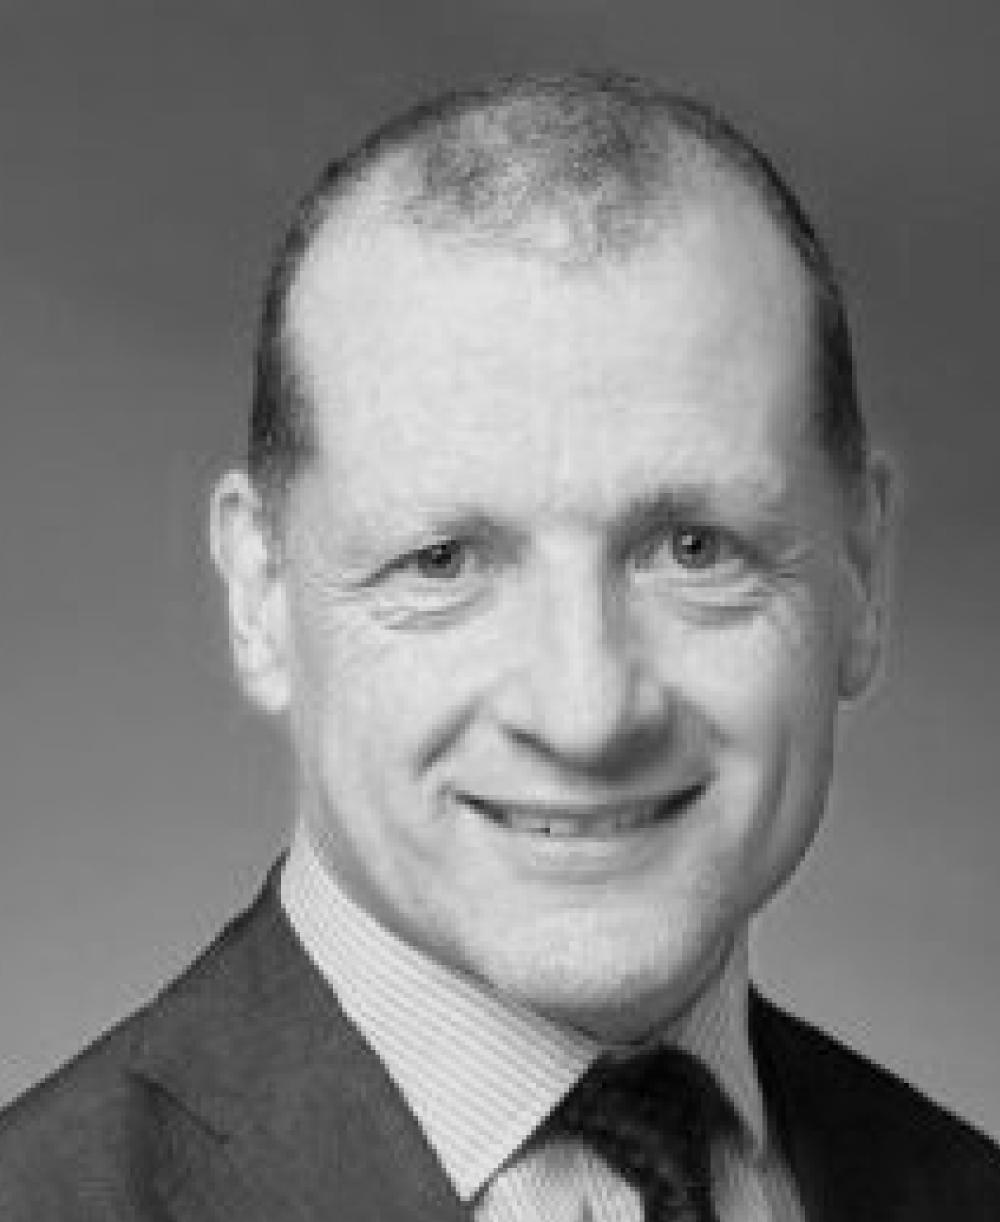 Carl Ward, Group Technology Officer, Accenture